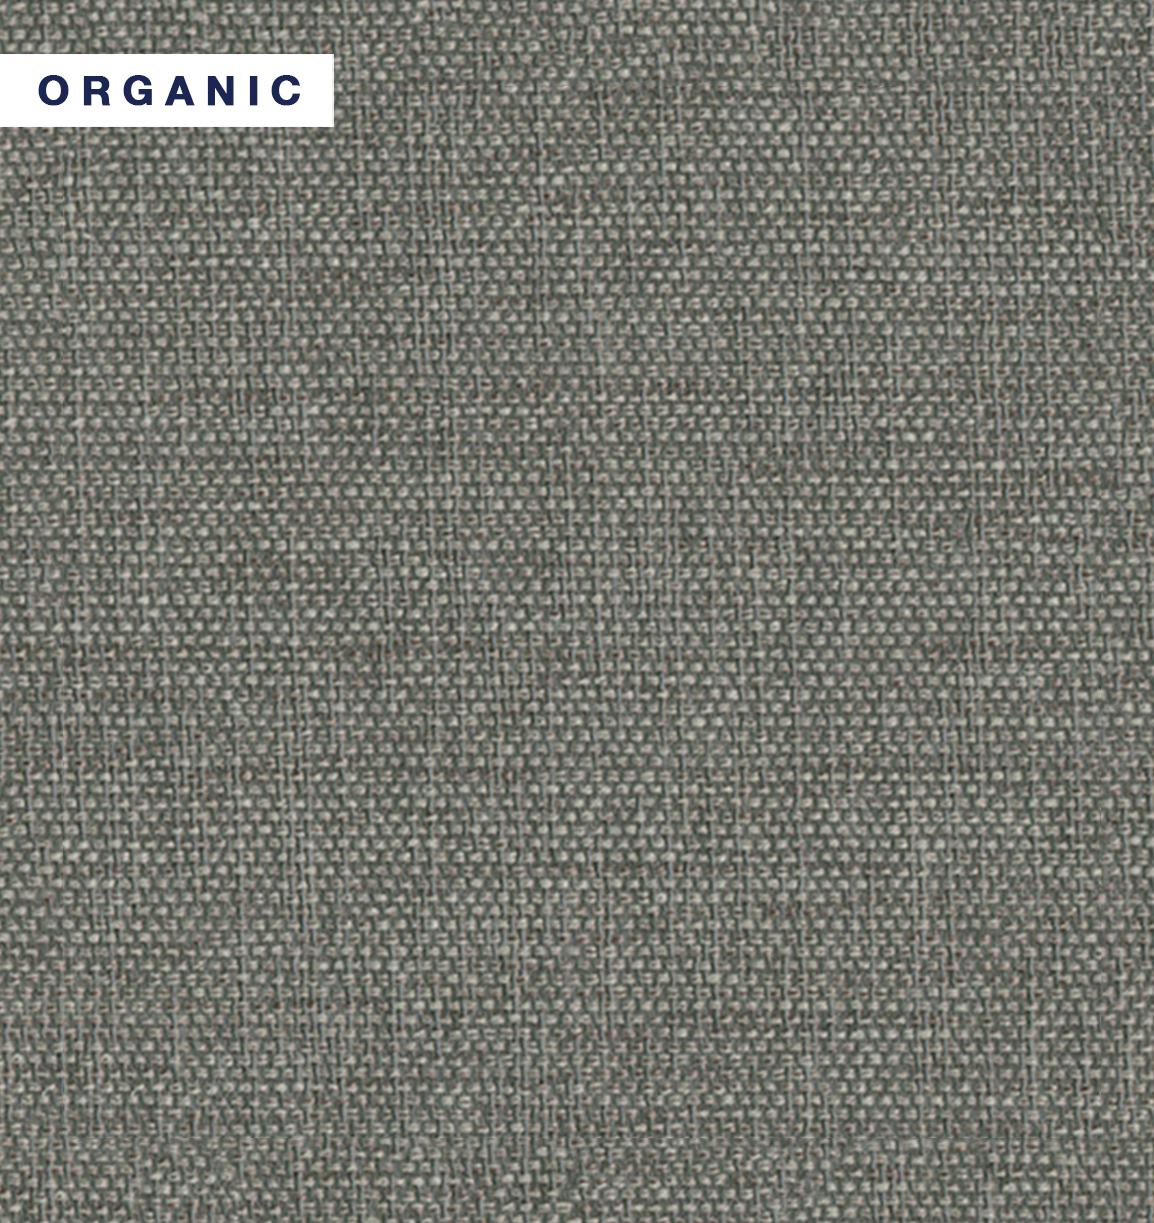 Jersey - Organic.jpg